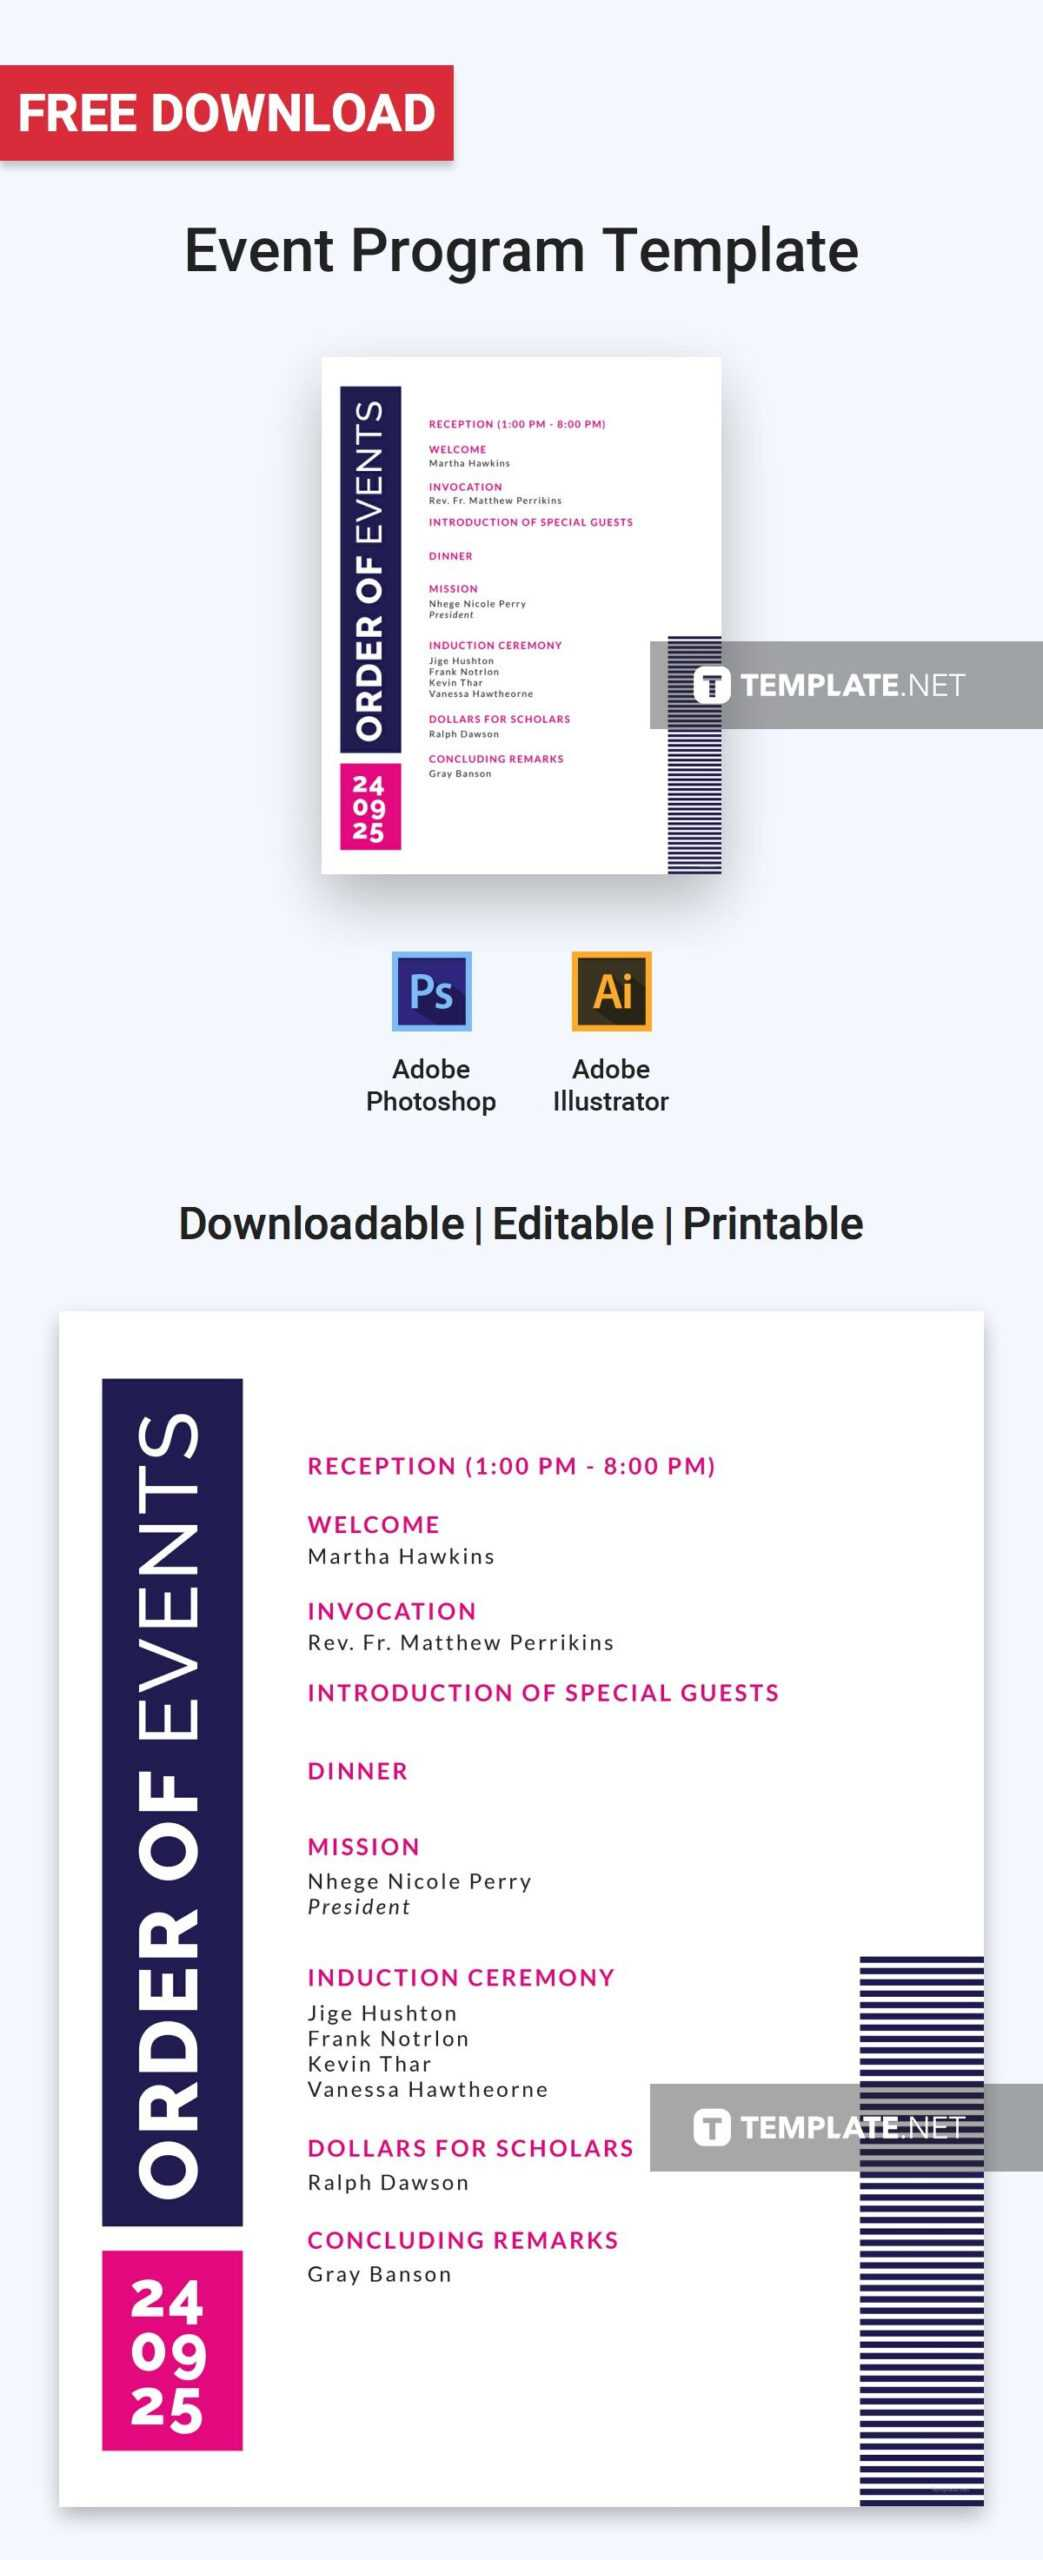 Free Event Program Invitation | Free Program Templates With Free Event Program Templates Word